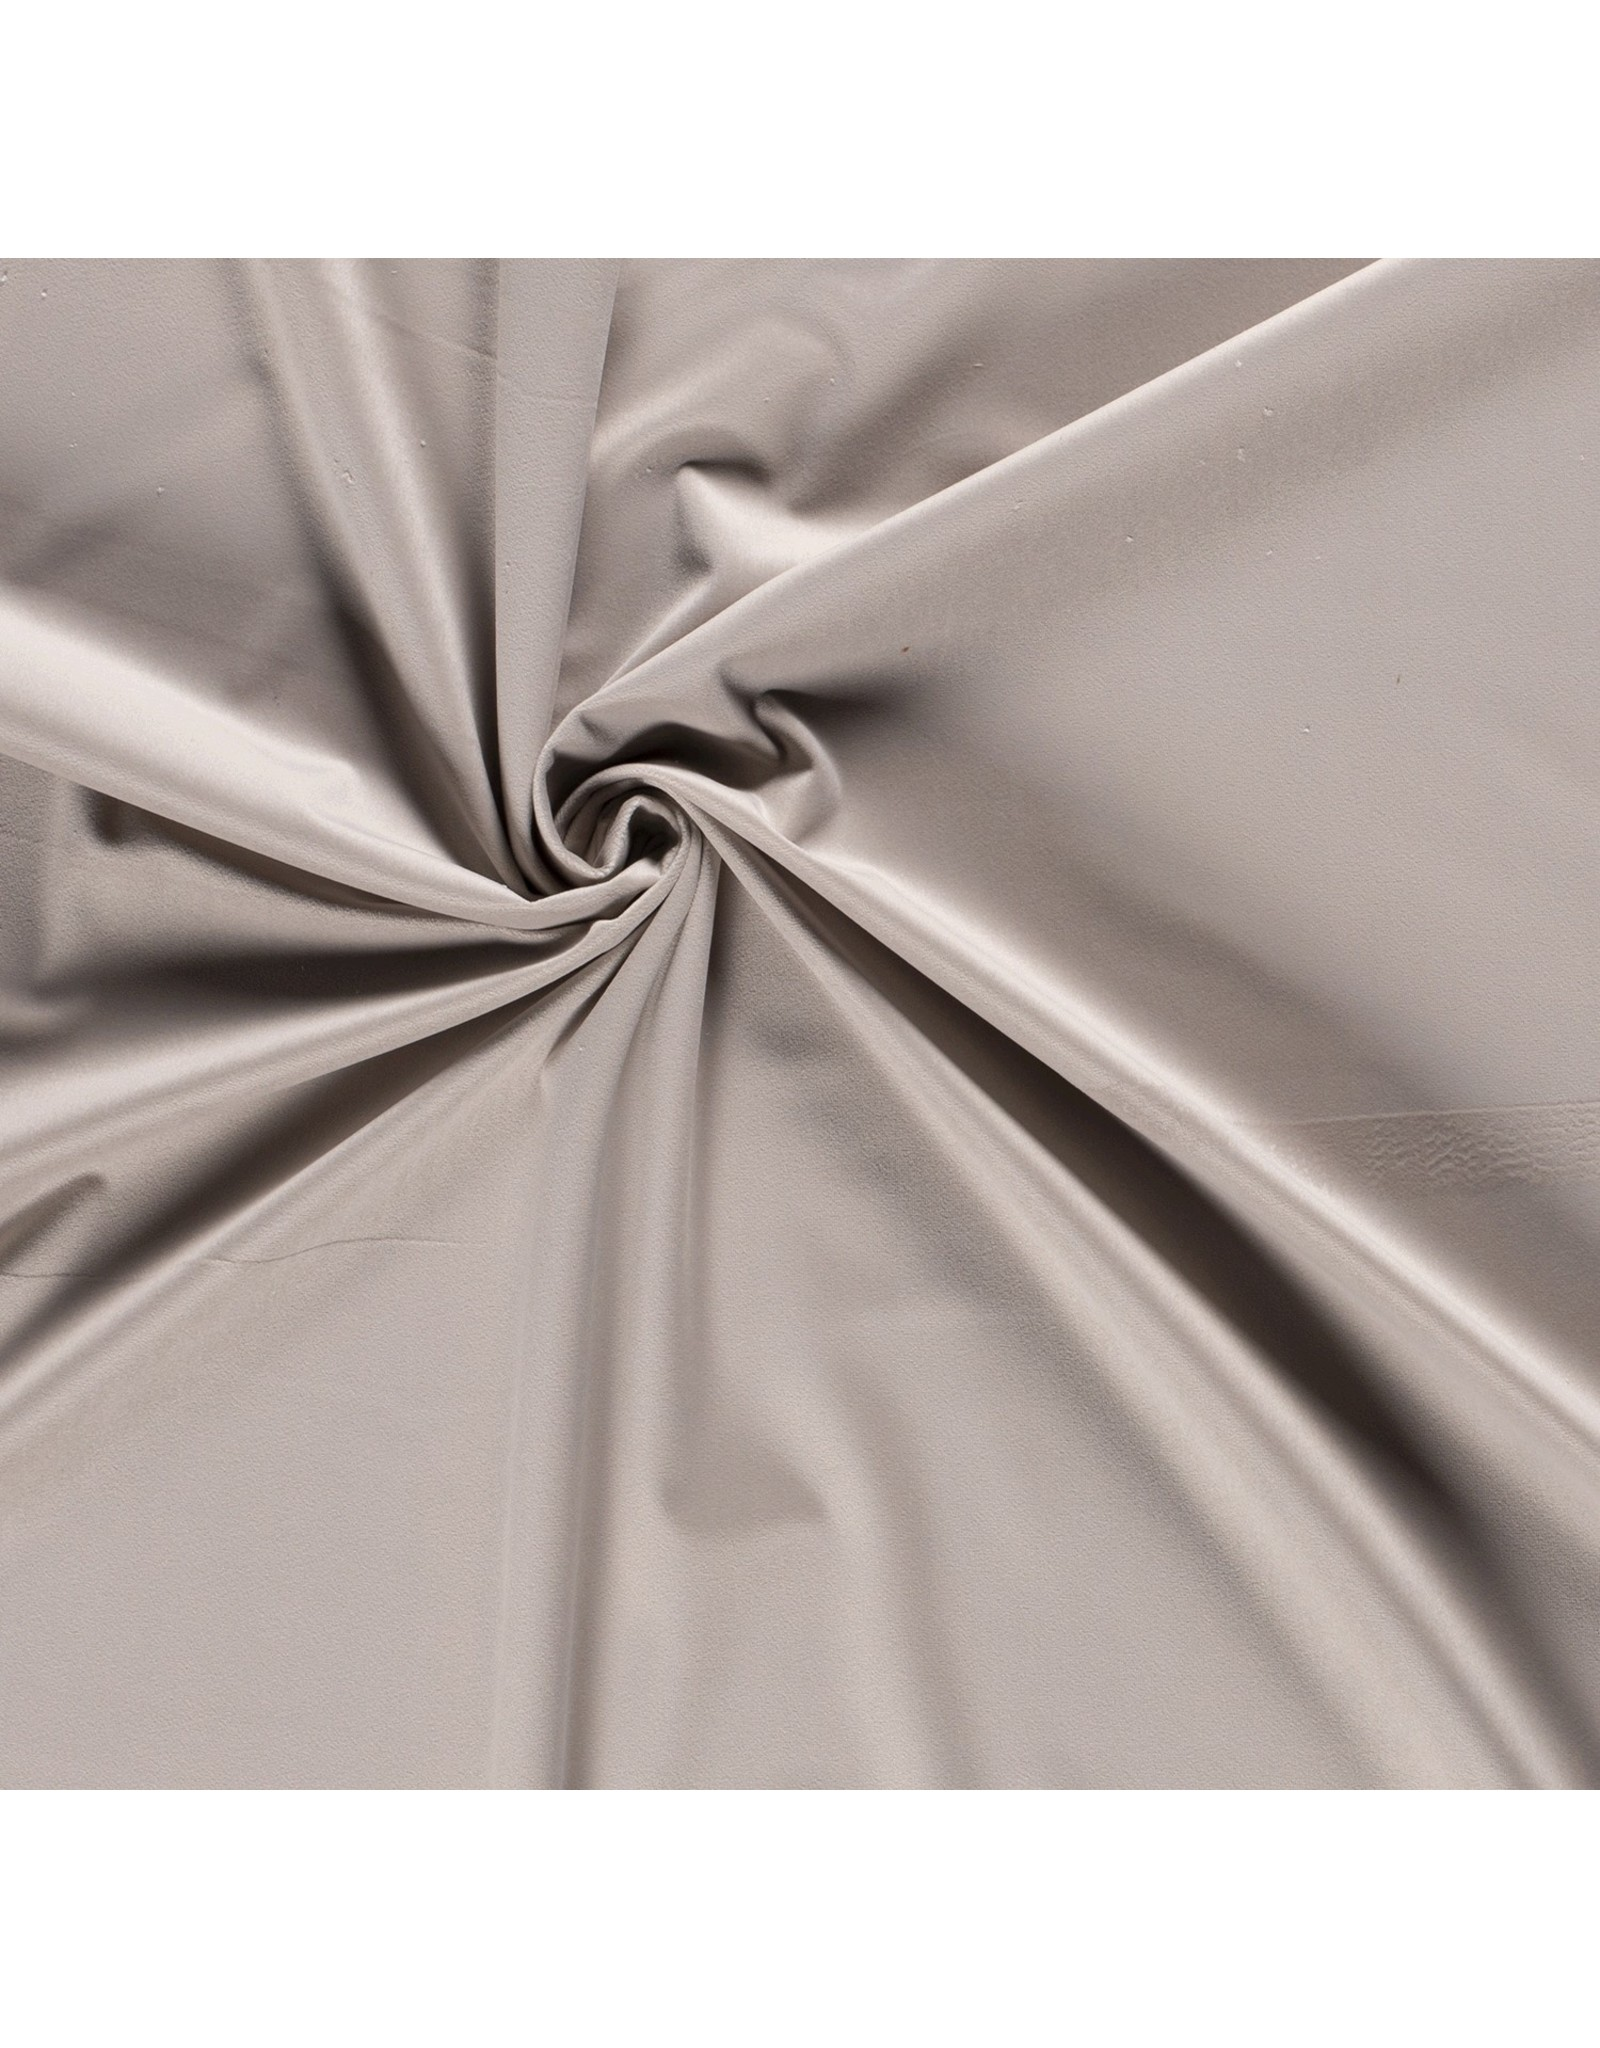 Nobodeco Home Velvet fabric Unicolour Beige